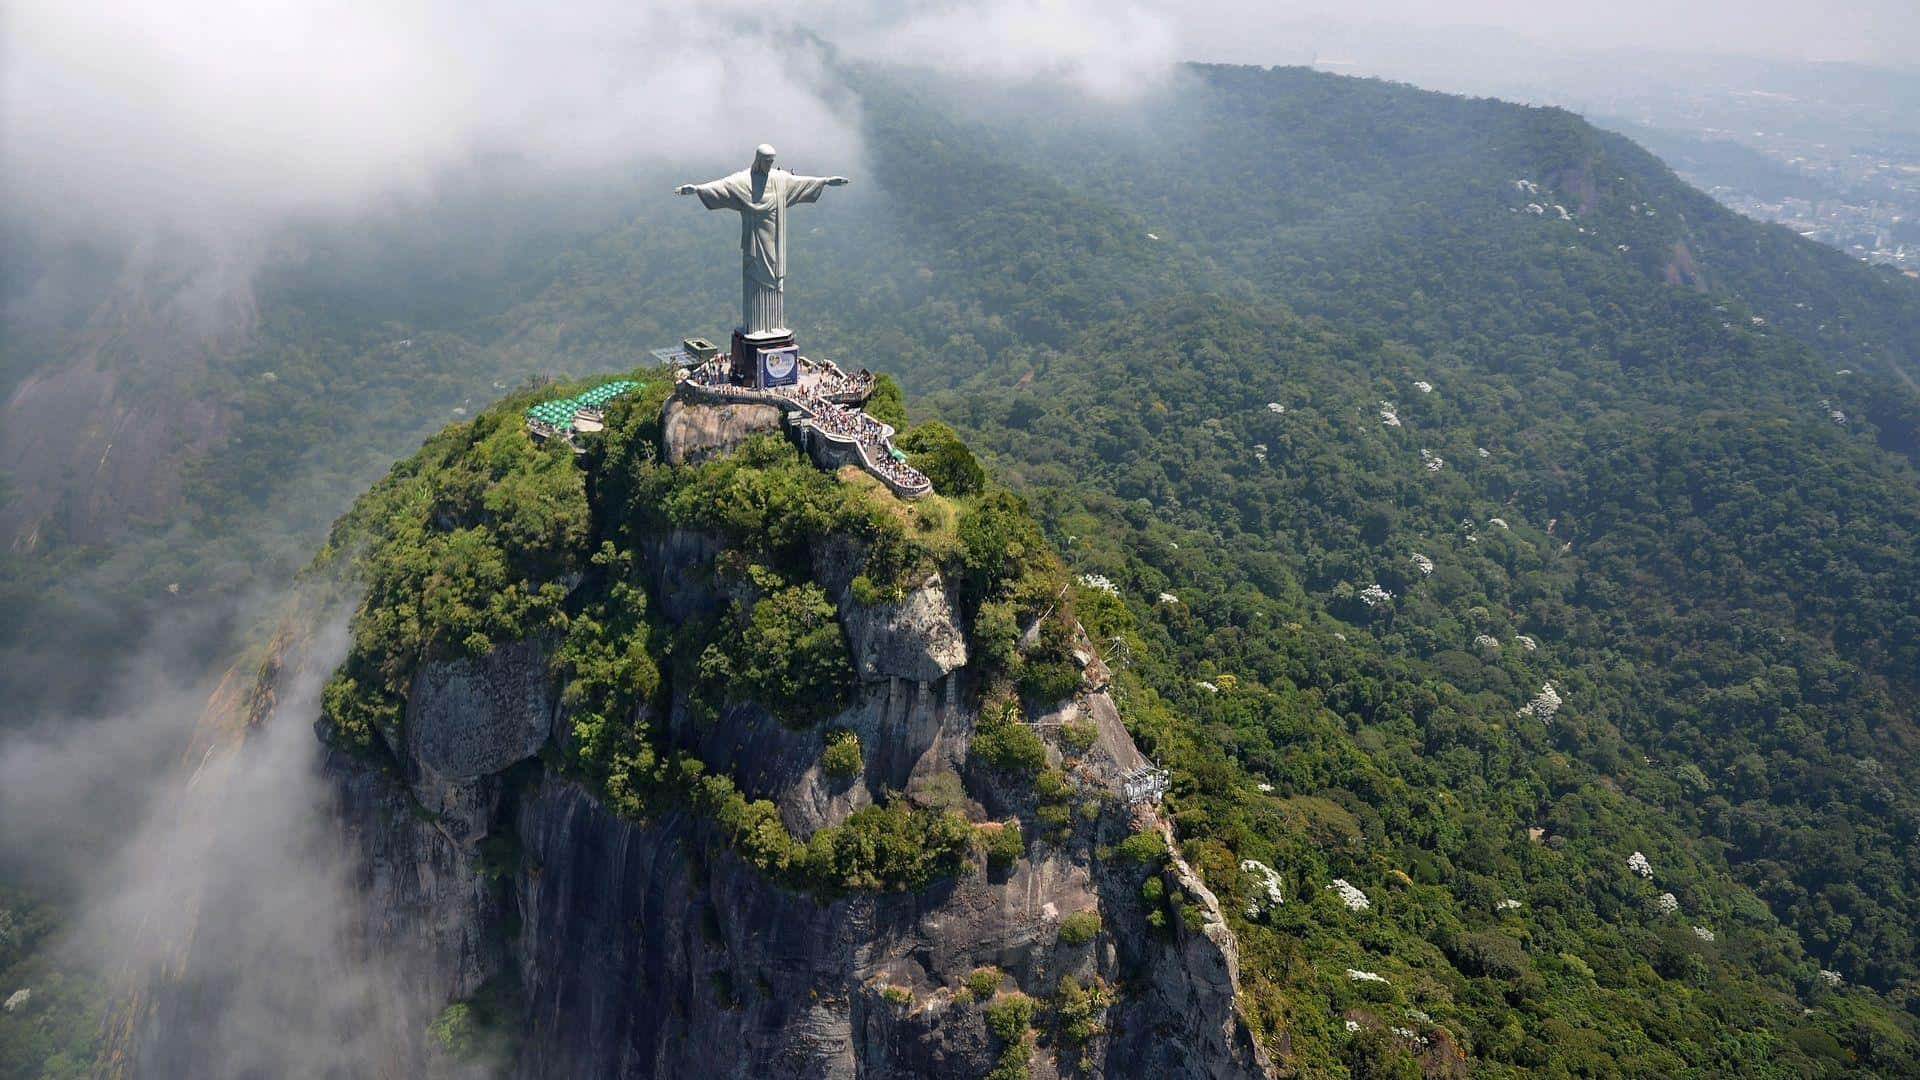 Christ the Redeemer Statue the symbol of the Rio de Janerio